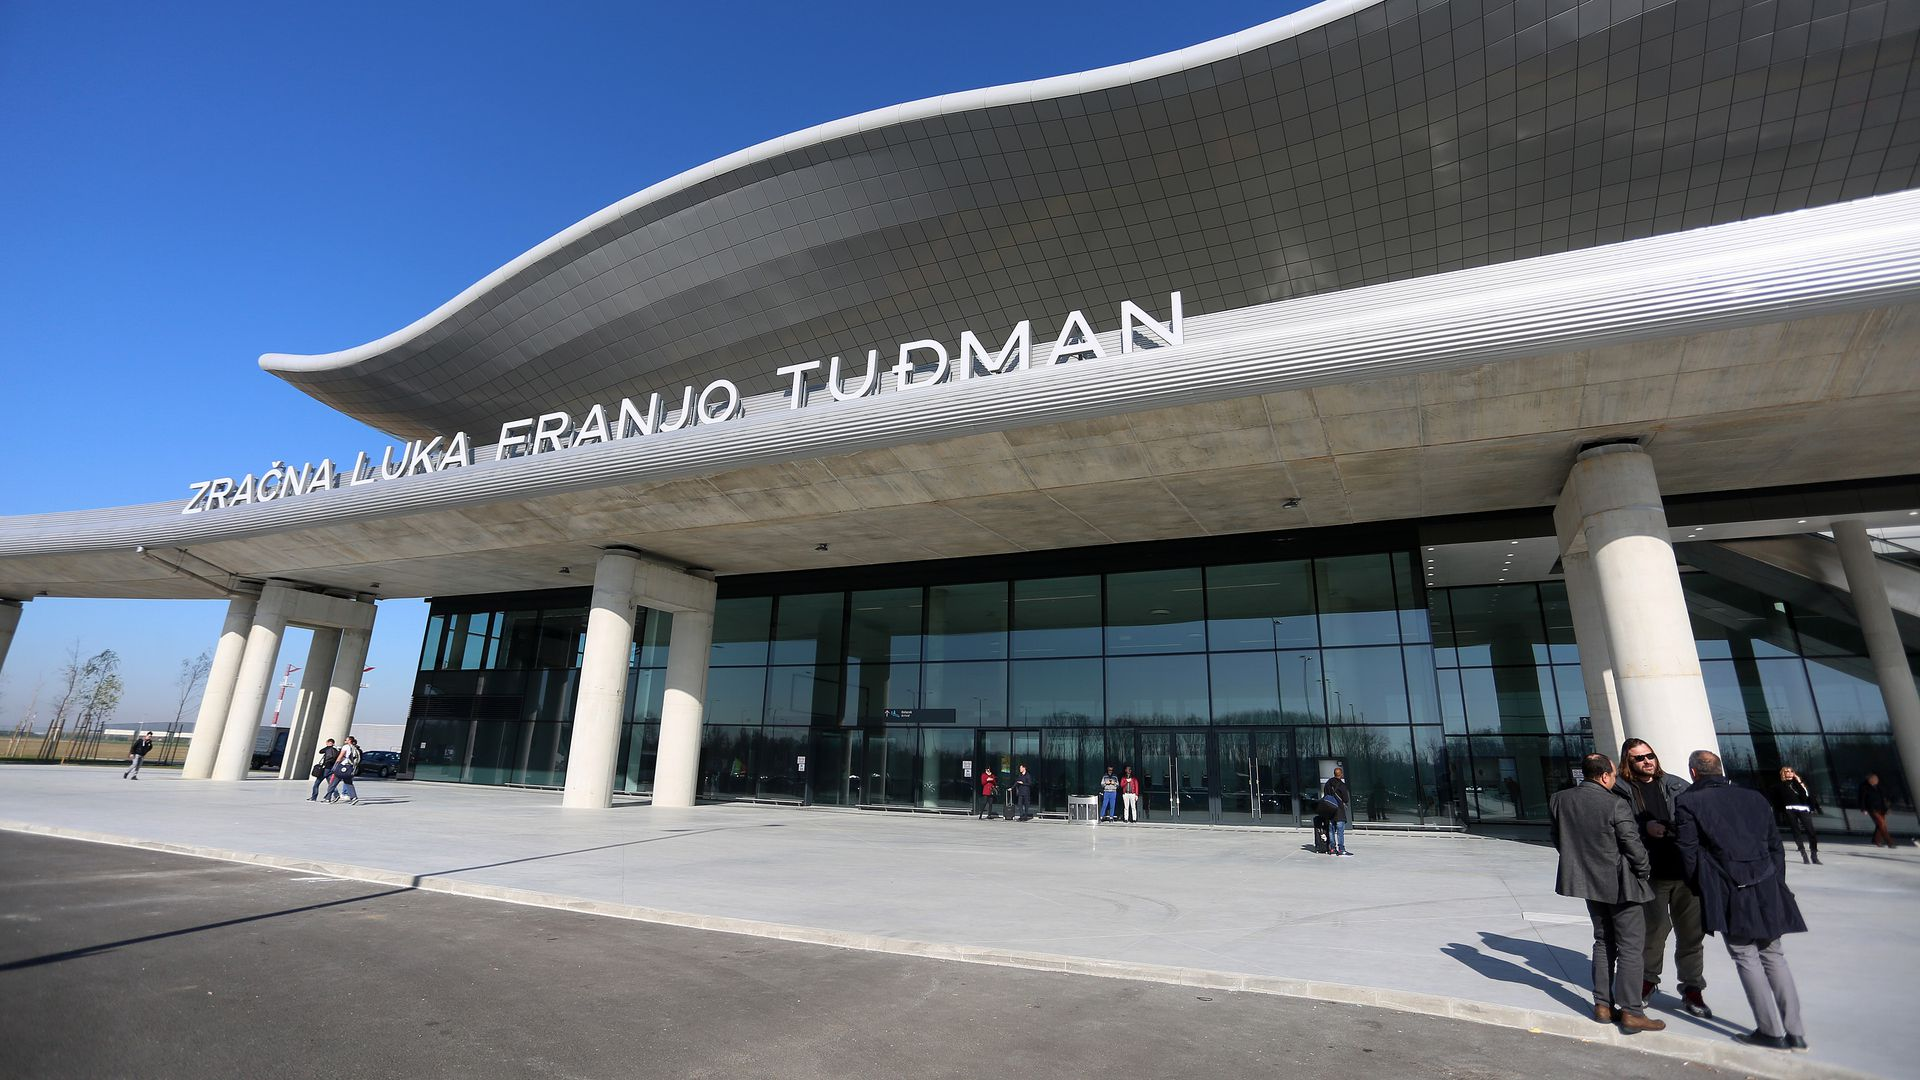 Međunarodna Zracna Luka Zagreb International Airport Zagreb Servisne Informacije Za Grad Zagreb Zgportal Zagreb